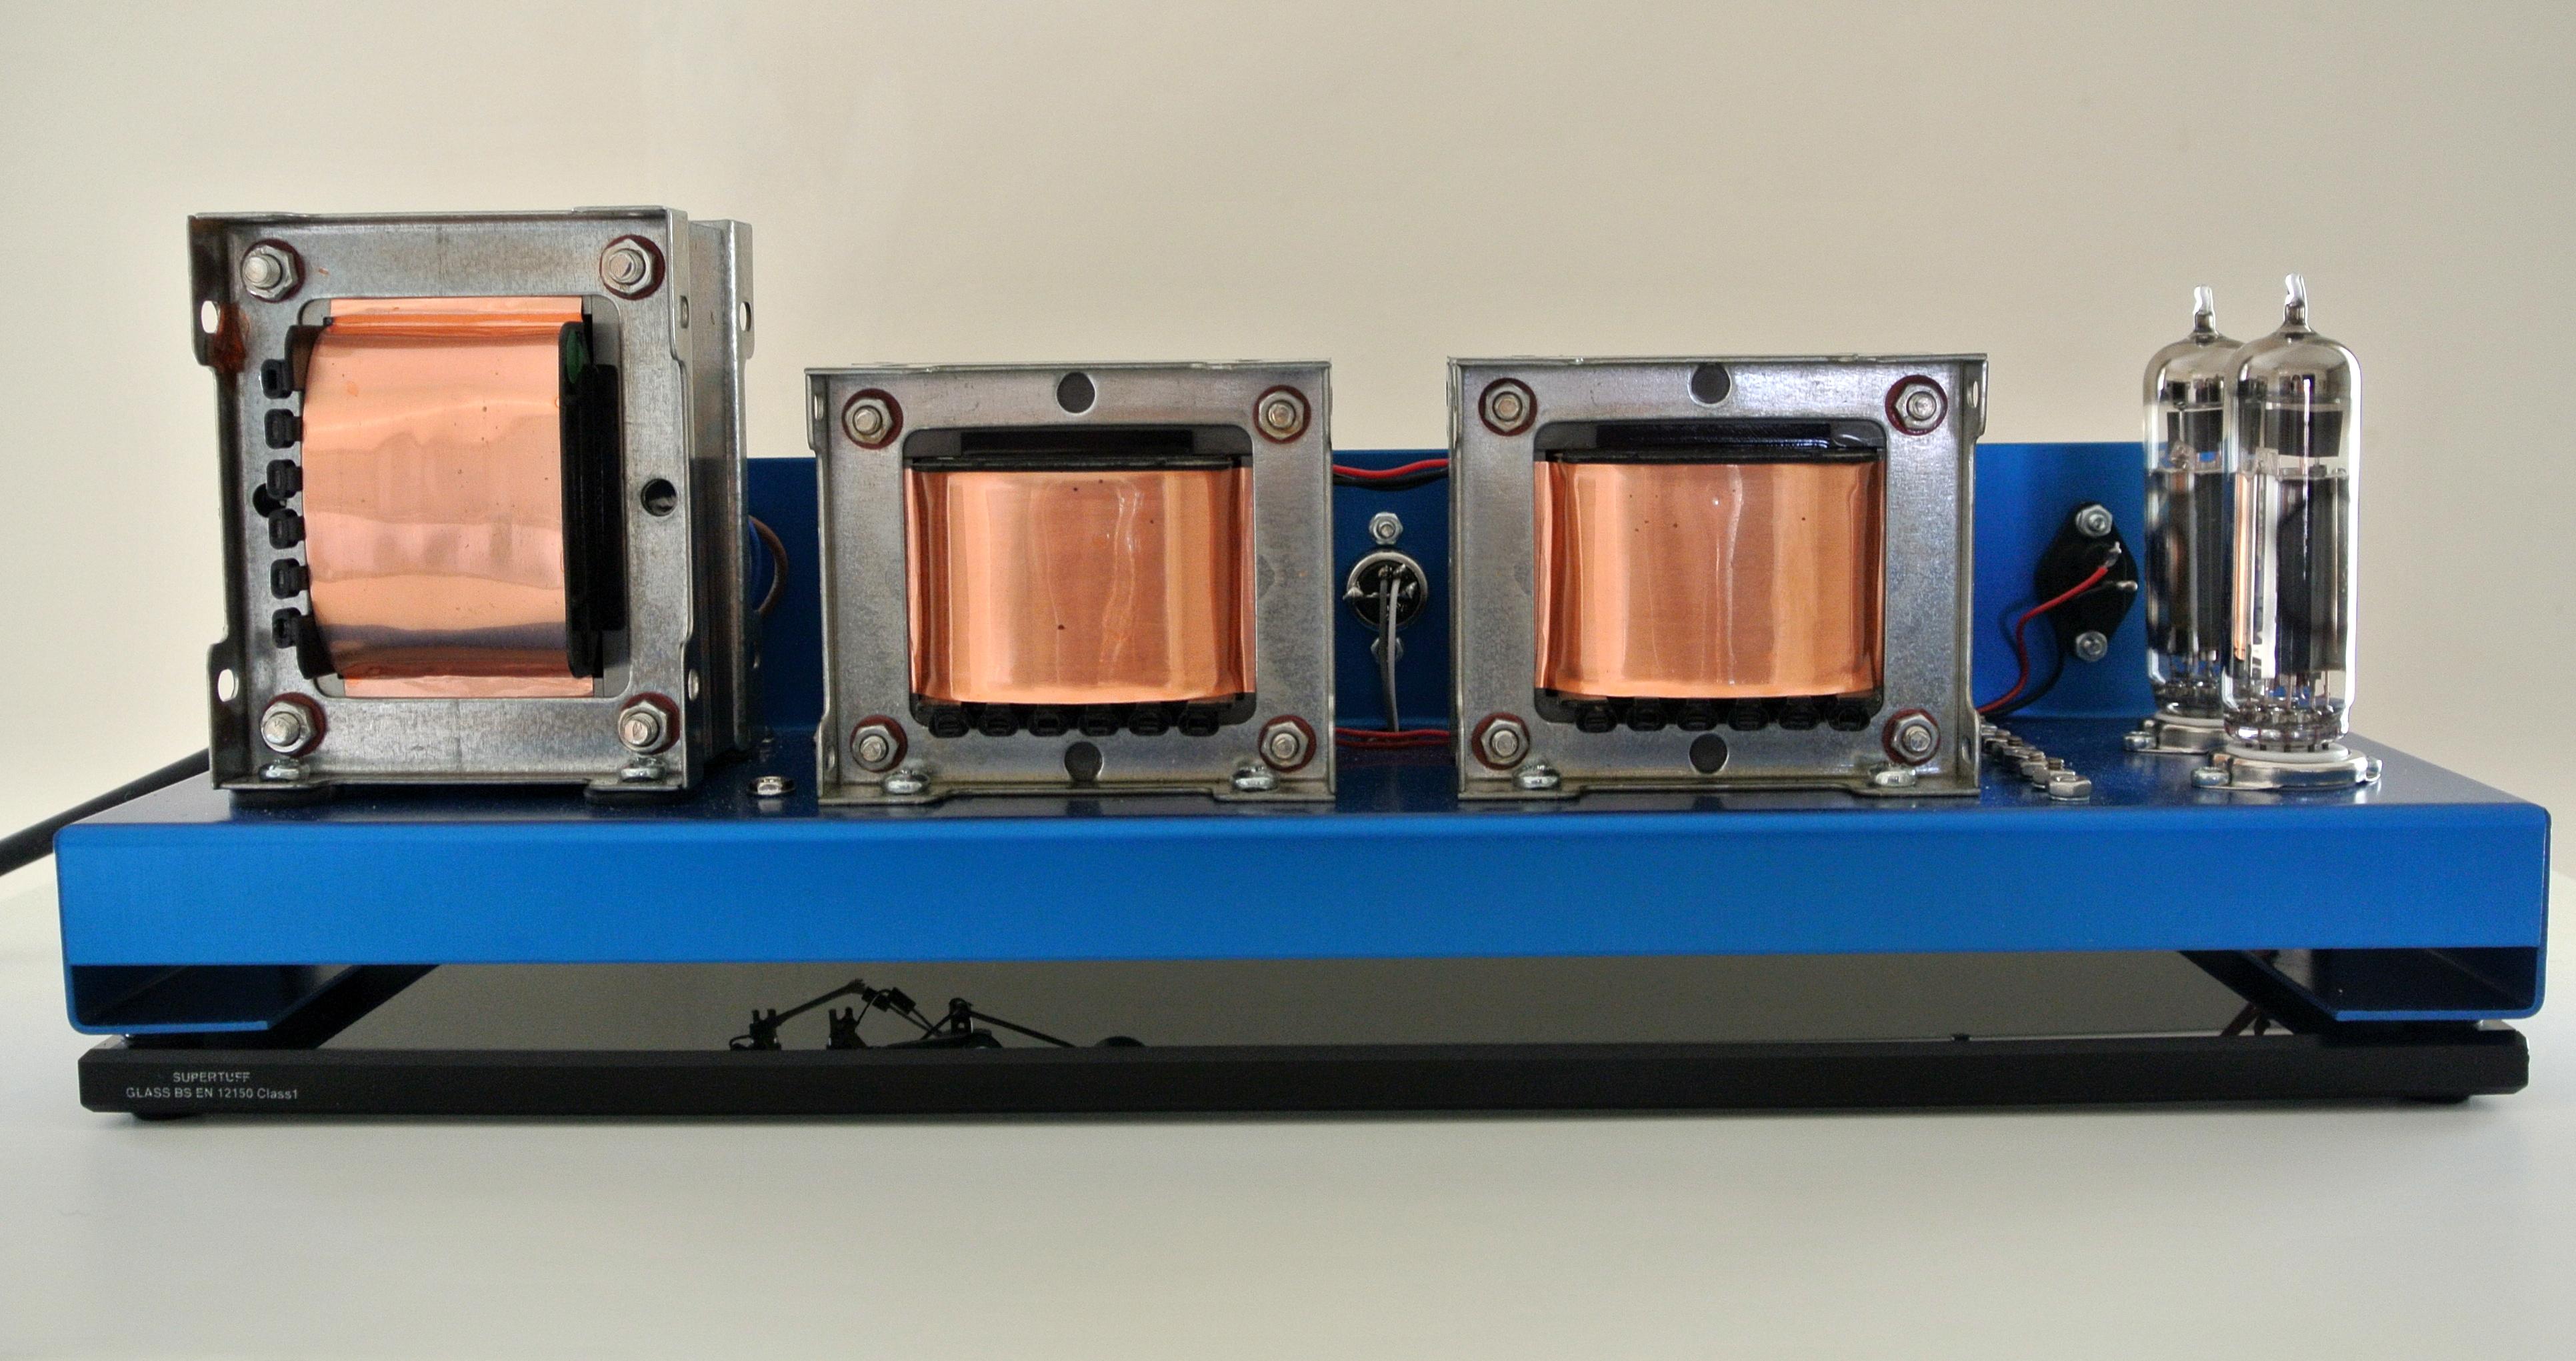 EL84 Tube Amplifier Set on Glass Plinth